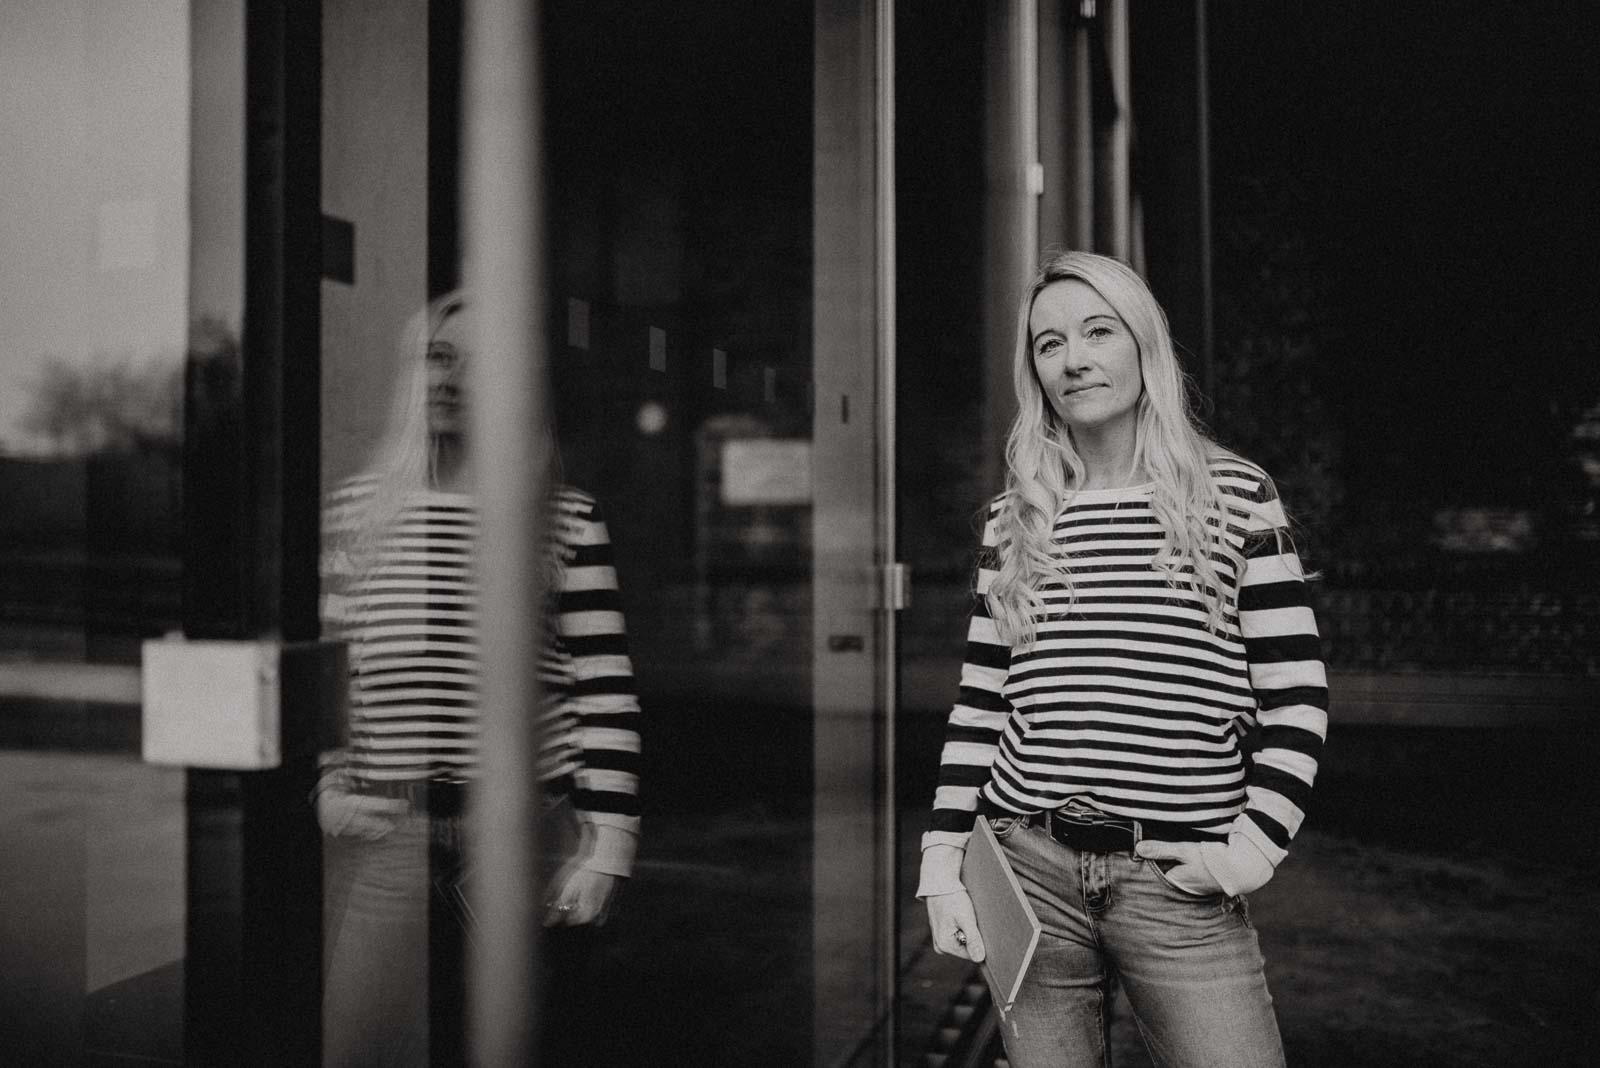 009-fotograf-witten-bochum-businessshooting-urban